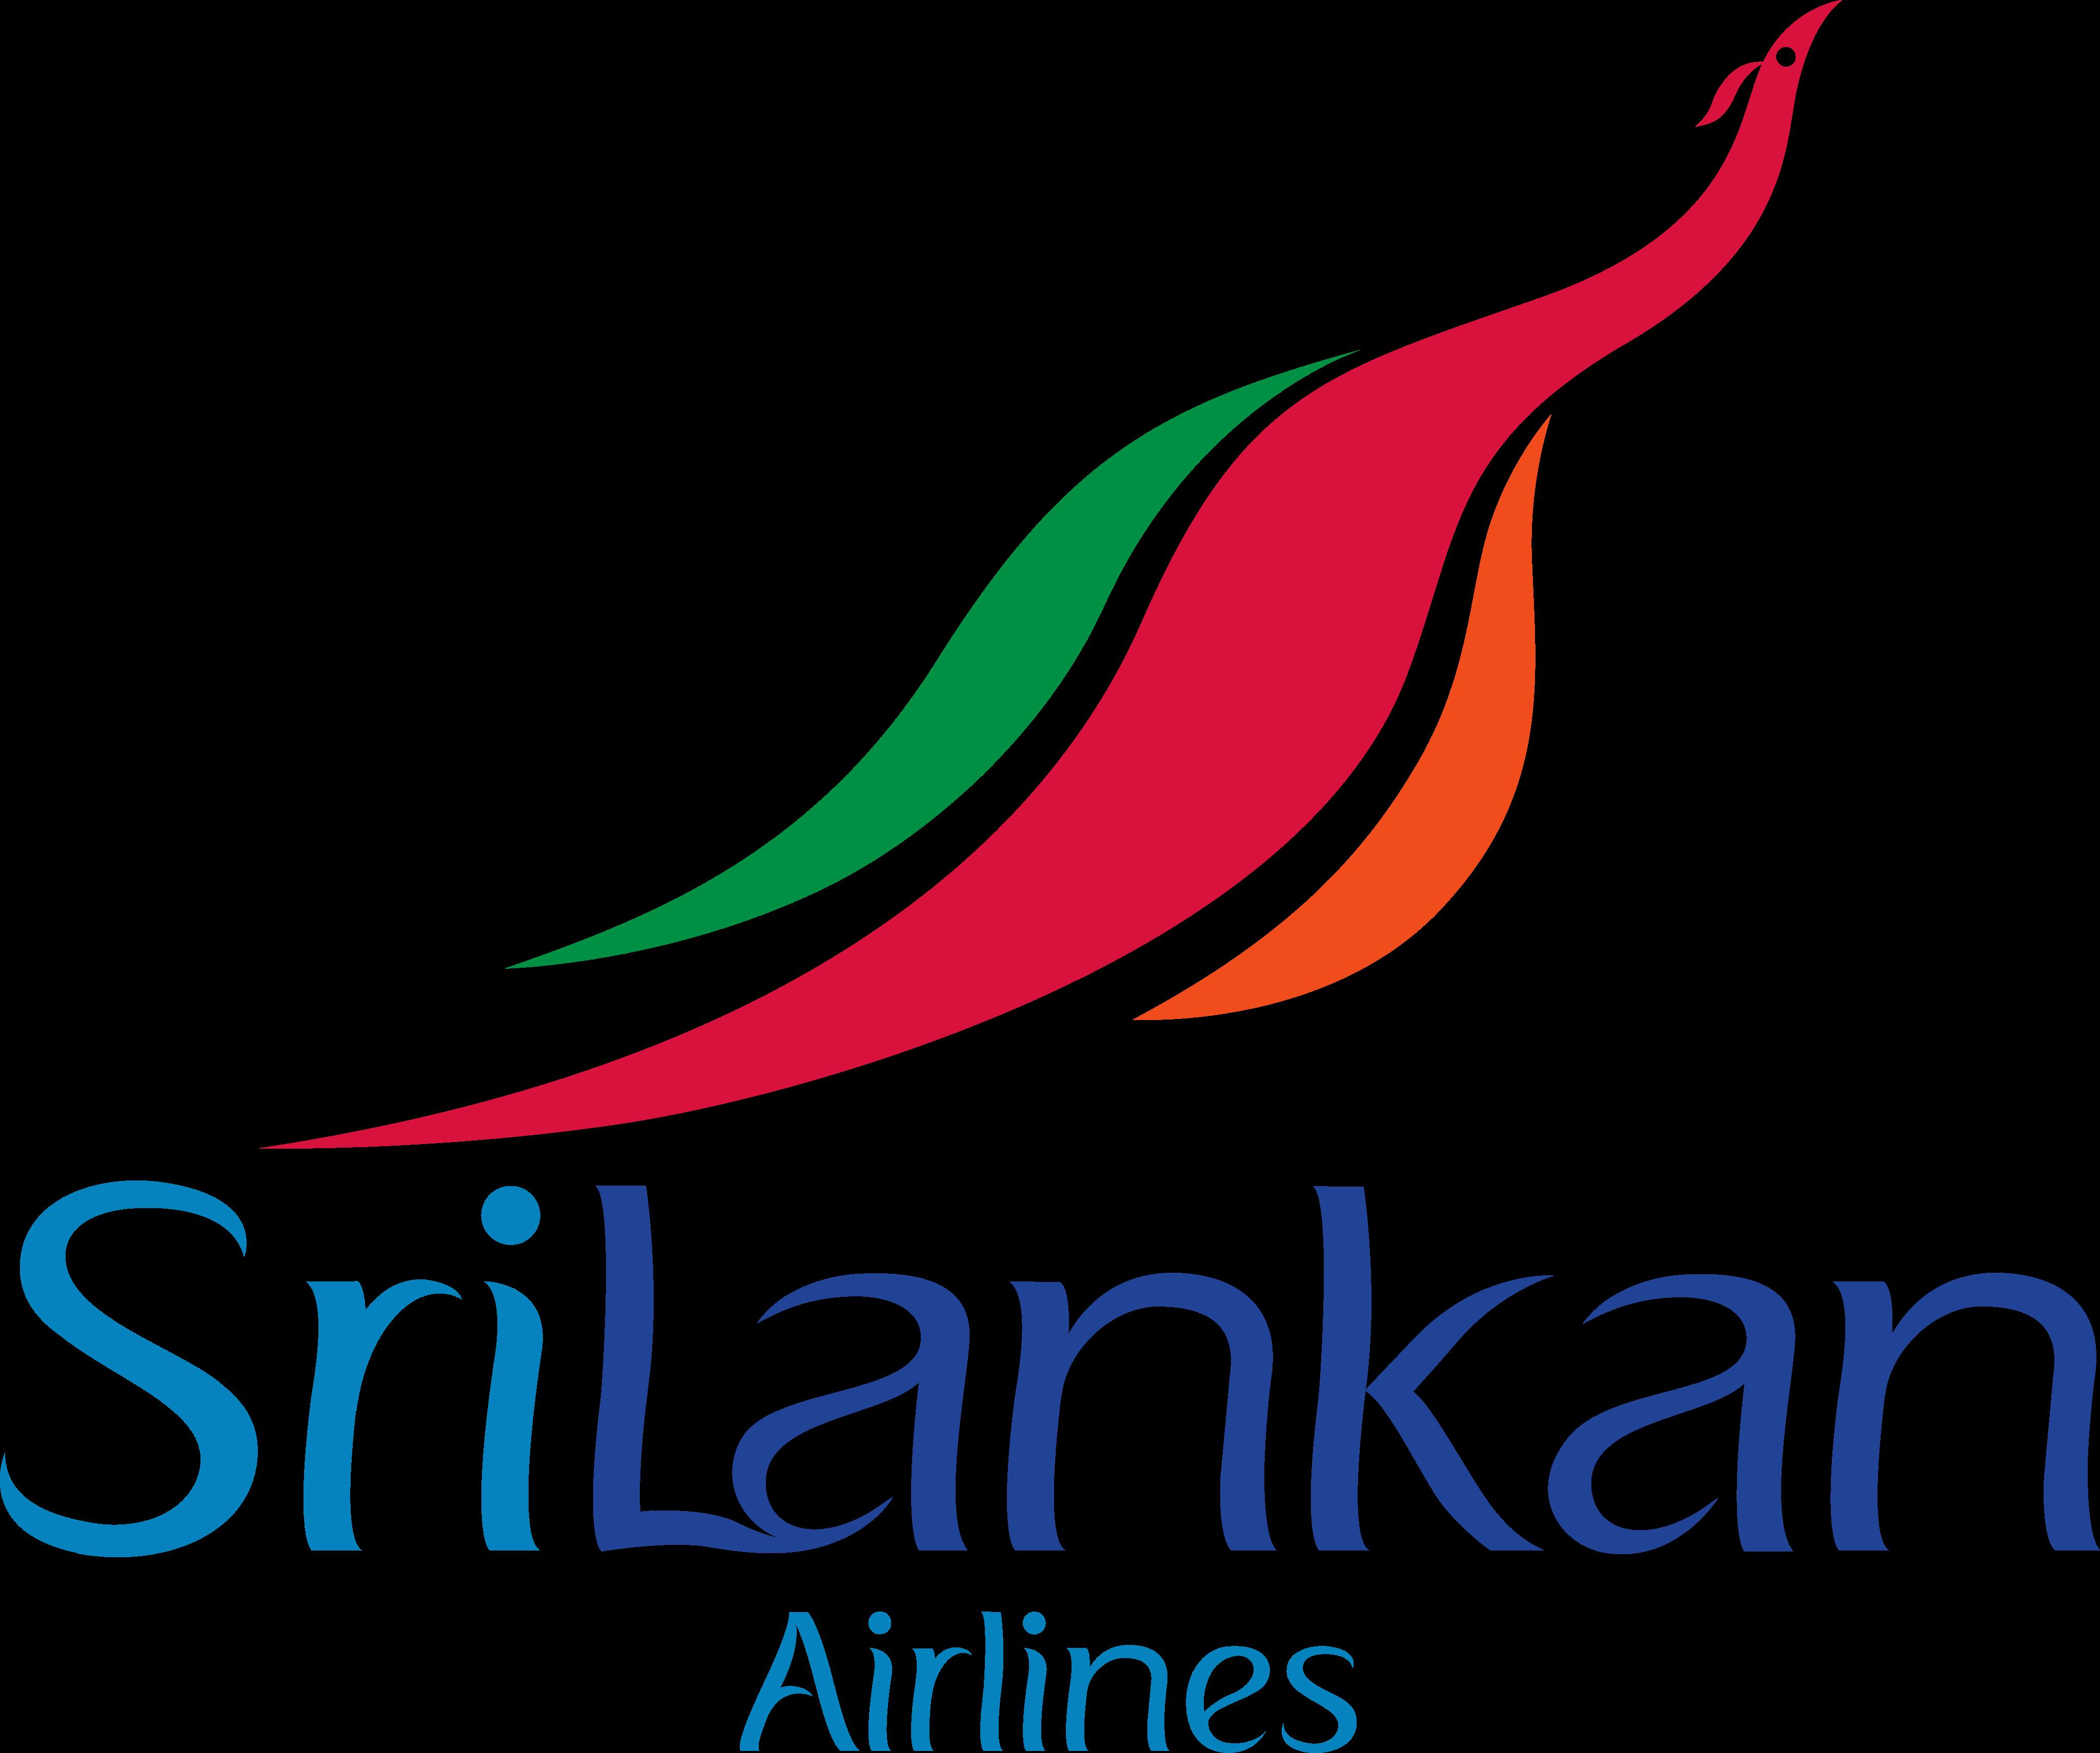 srilankan airlines logo 1 - SriLankan Airlines Logo